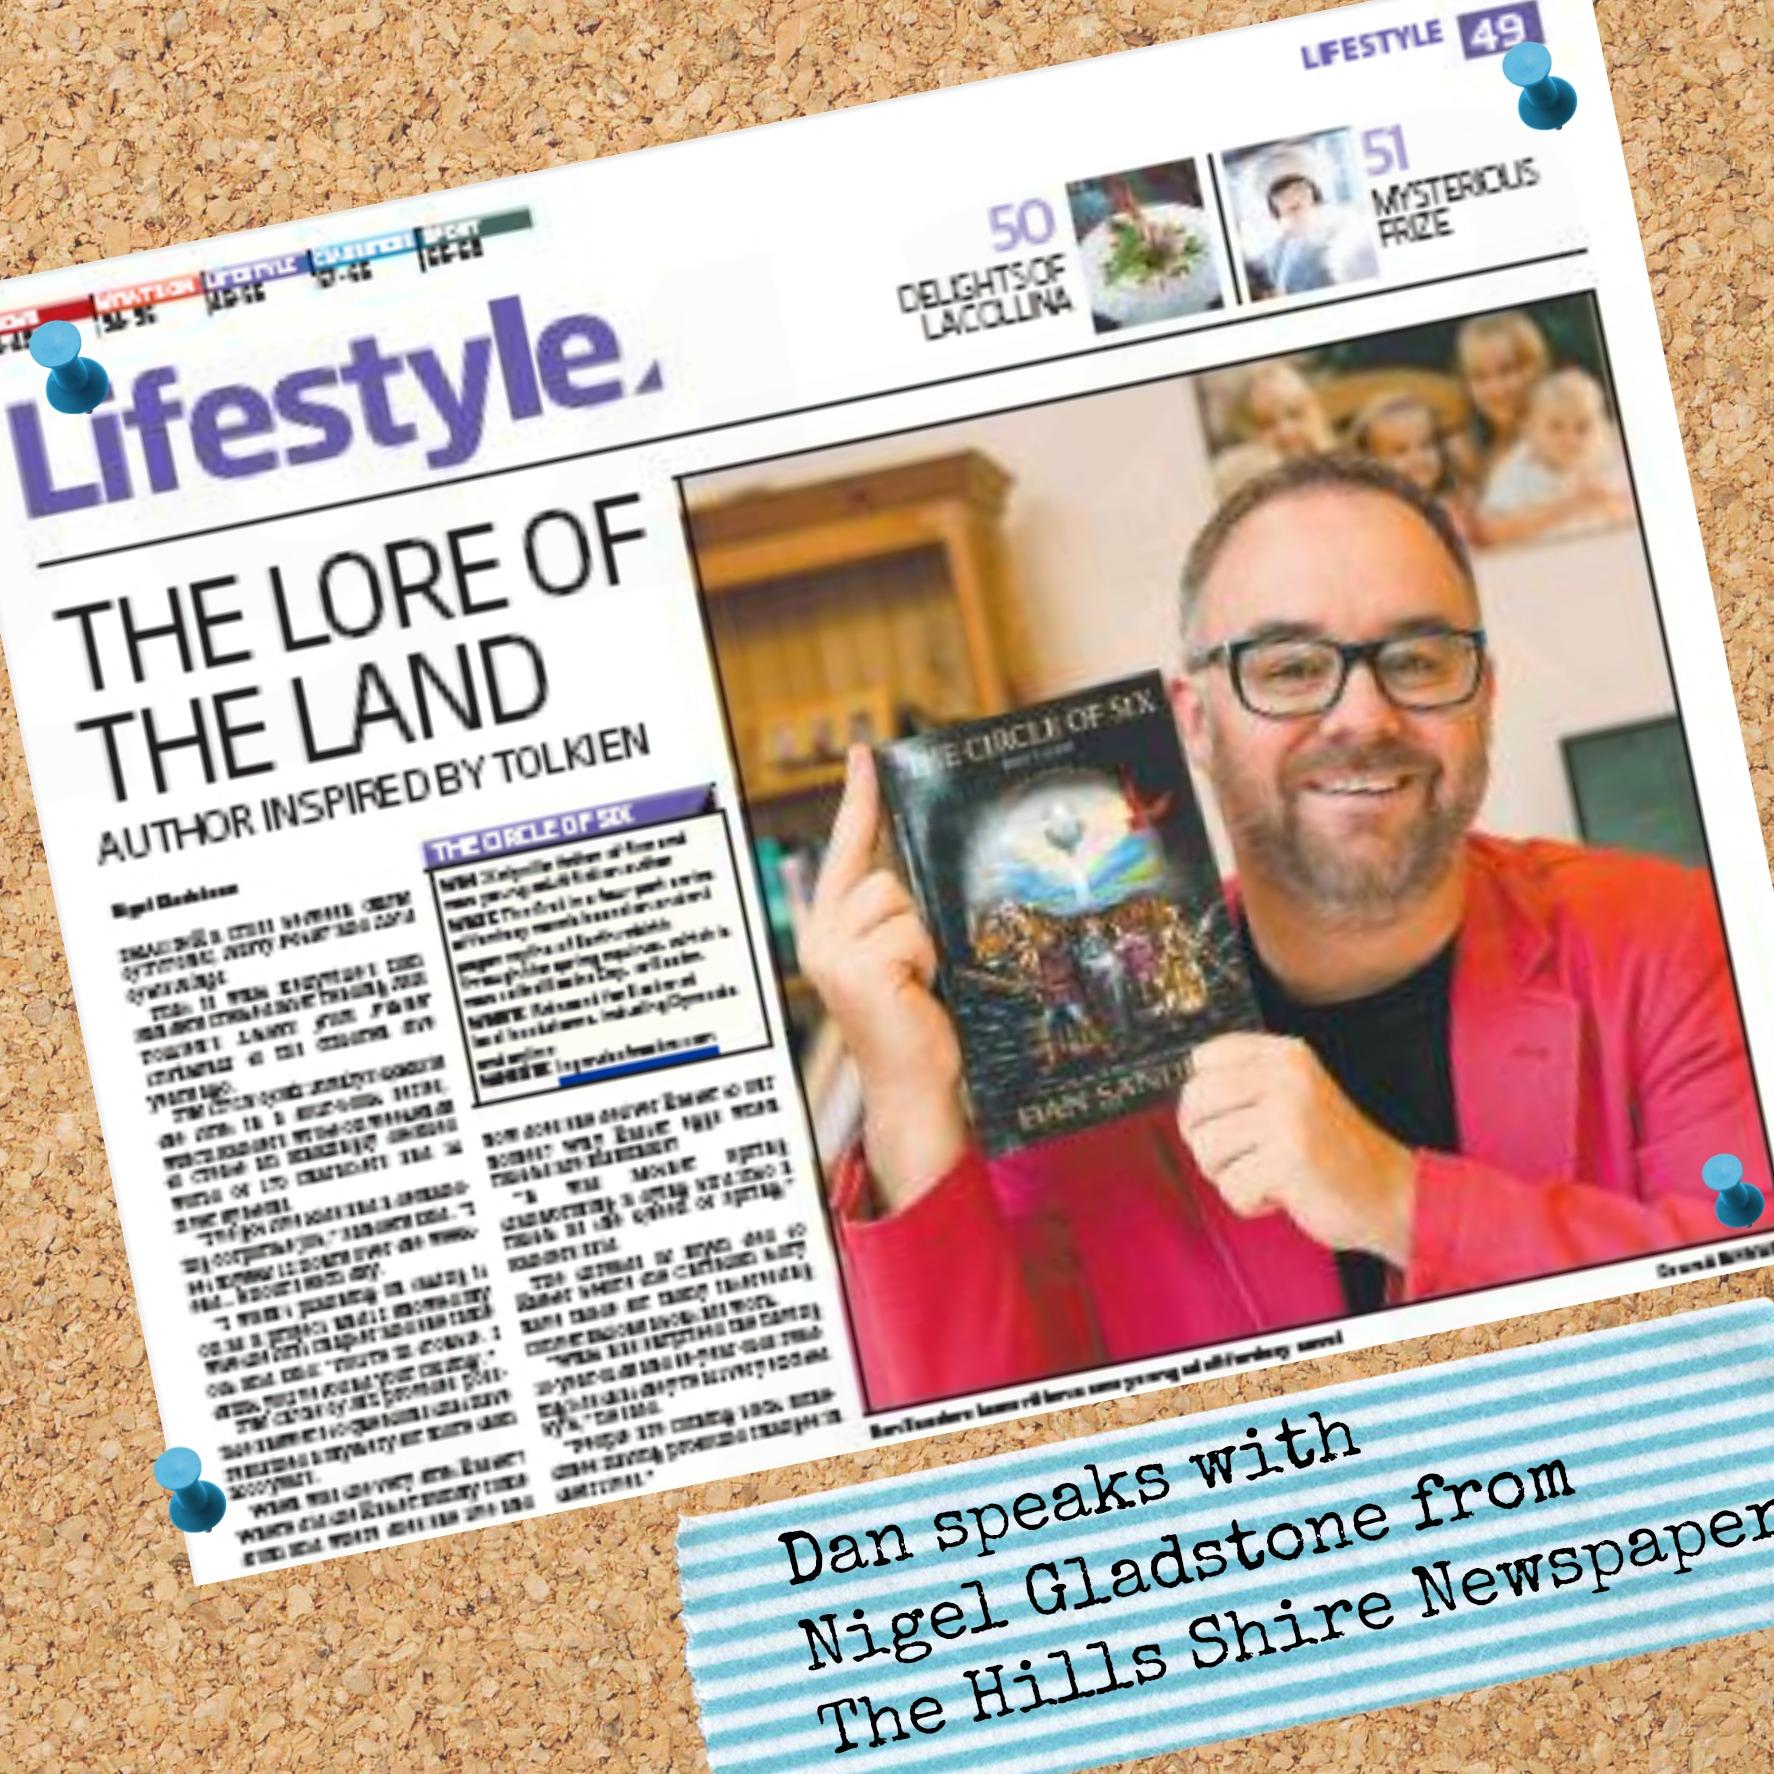 Hills Shire Newspaper